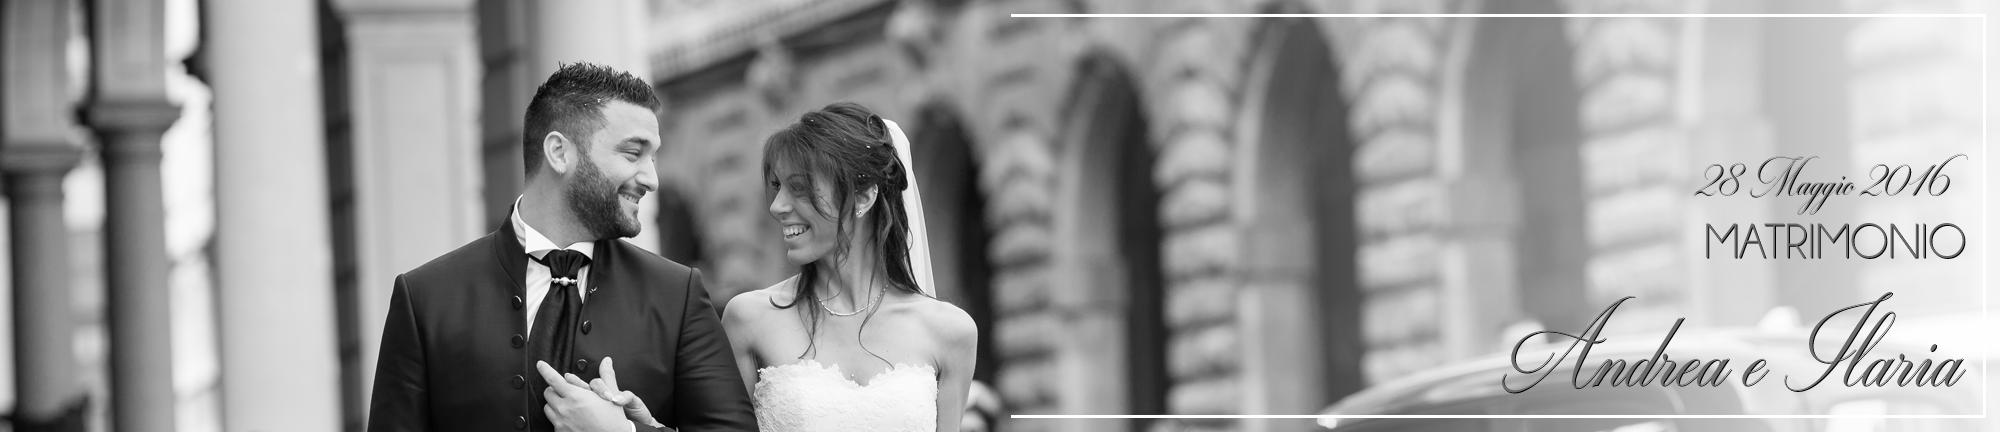 wedding_planner_fotografo_genova_andrea_ilaria